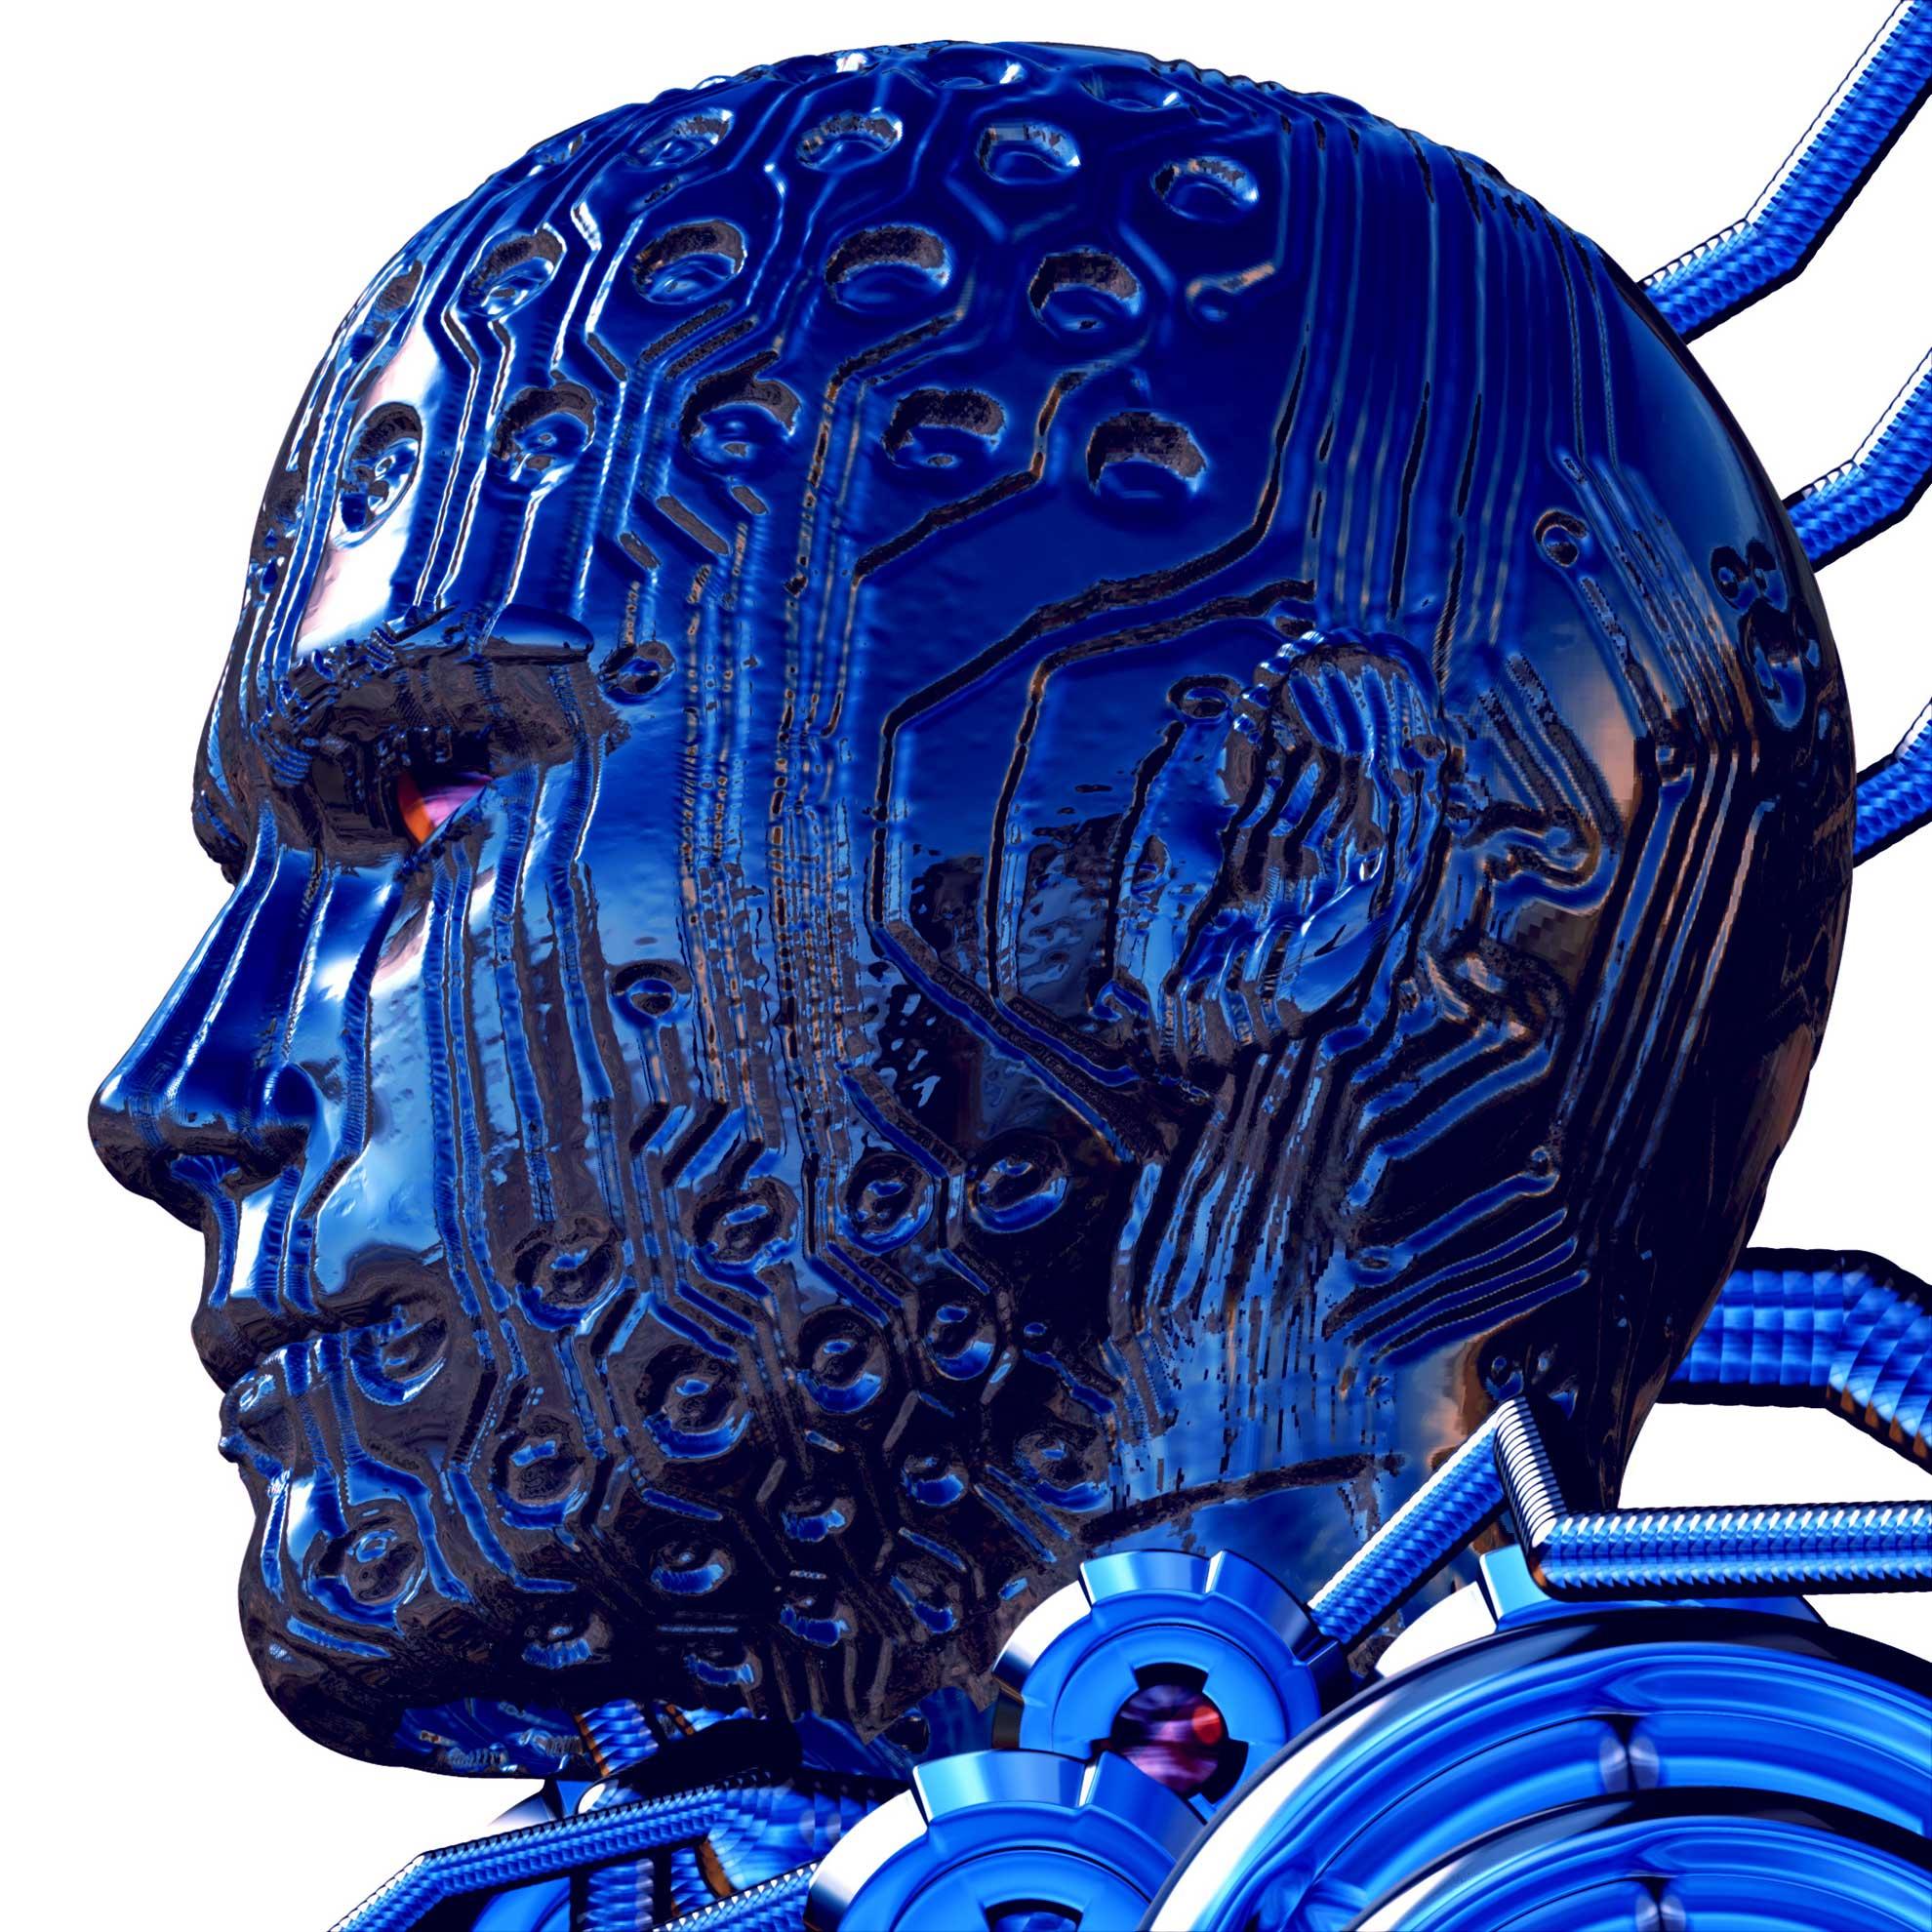 BS_Cyber-Male-head_Tonis-Pan_s